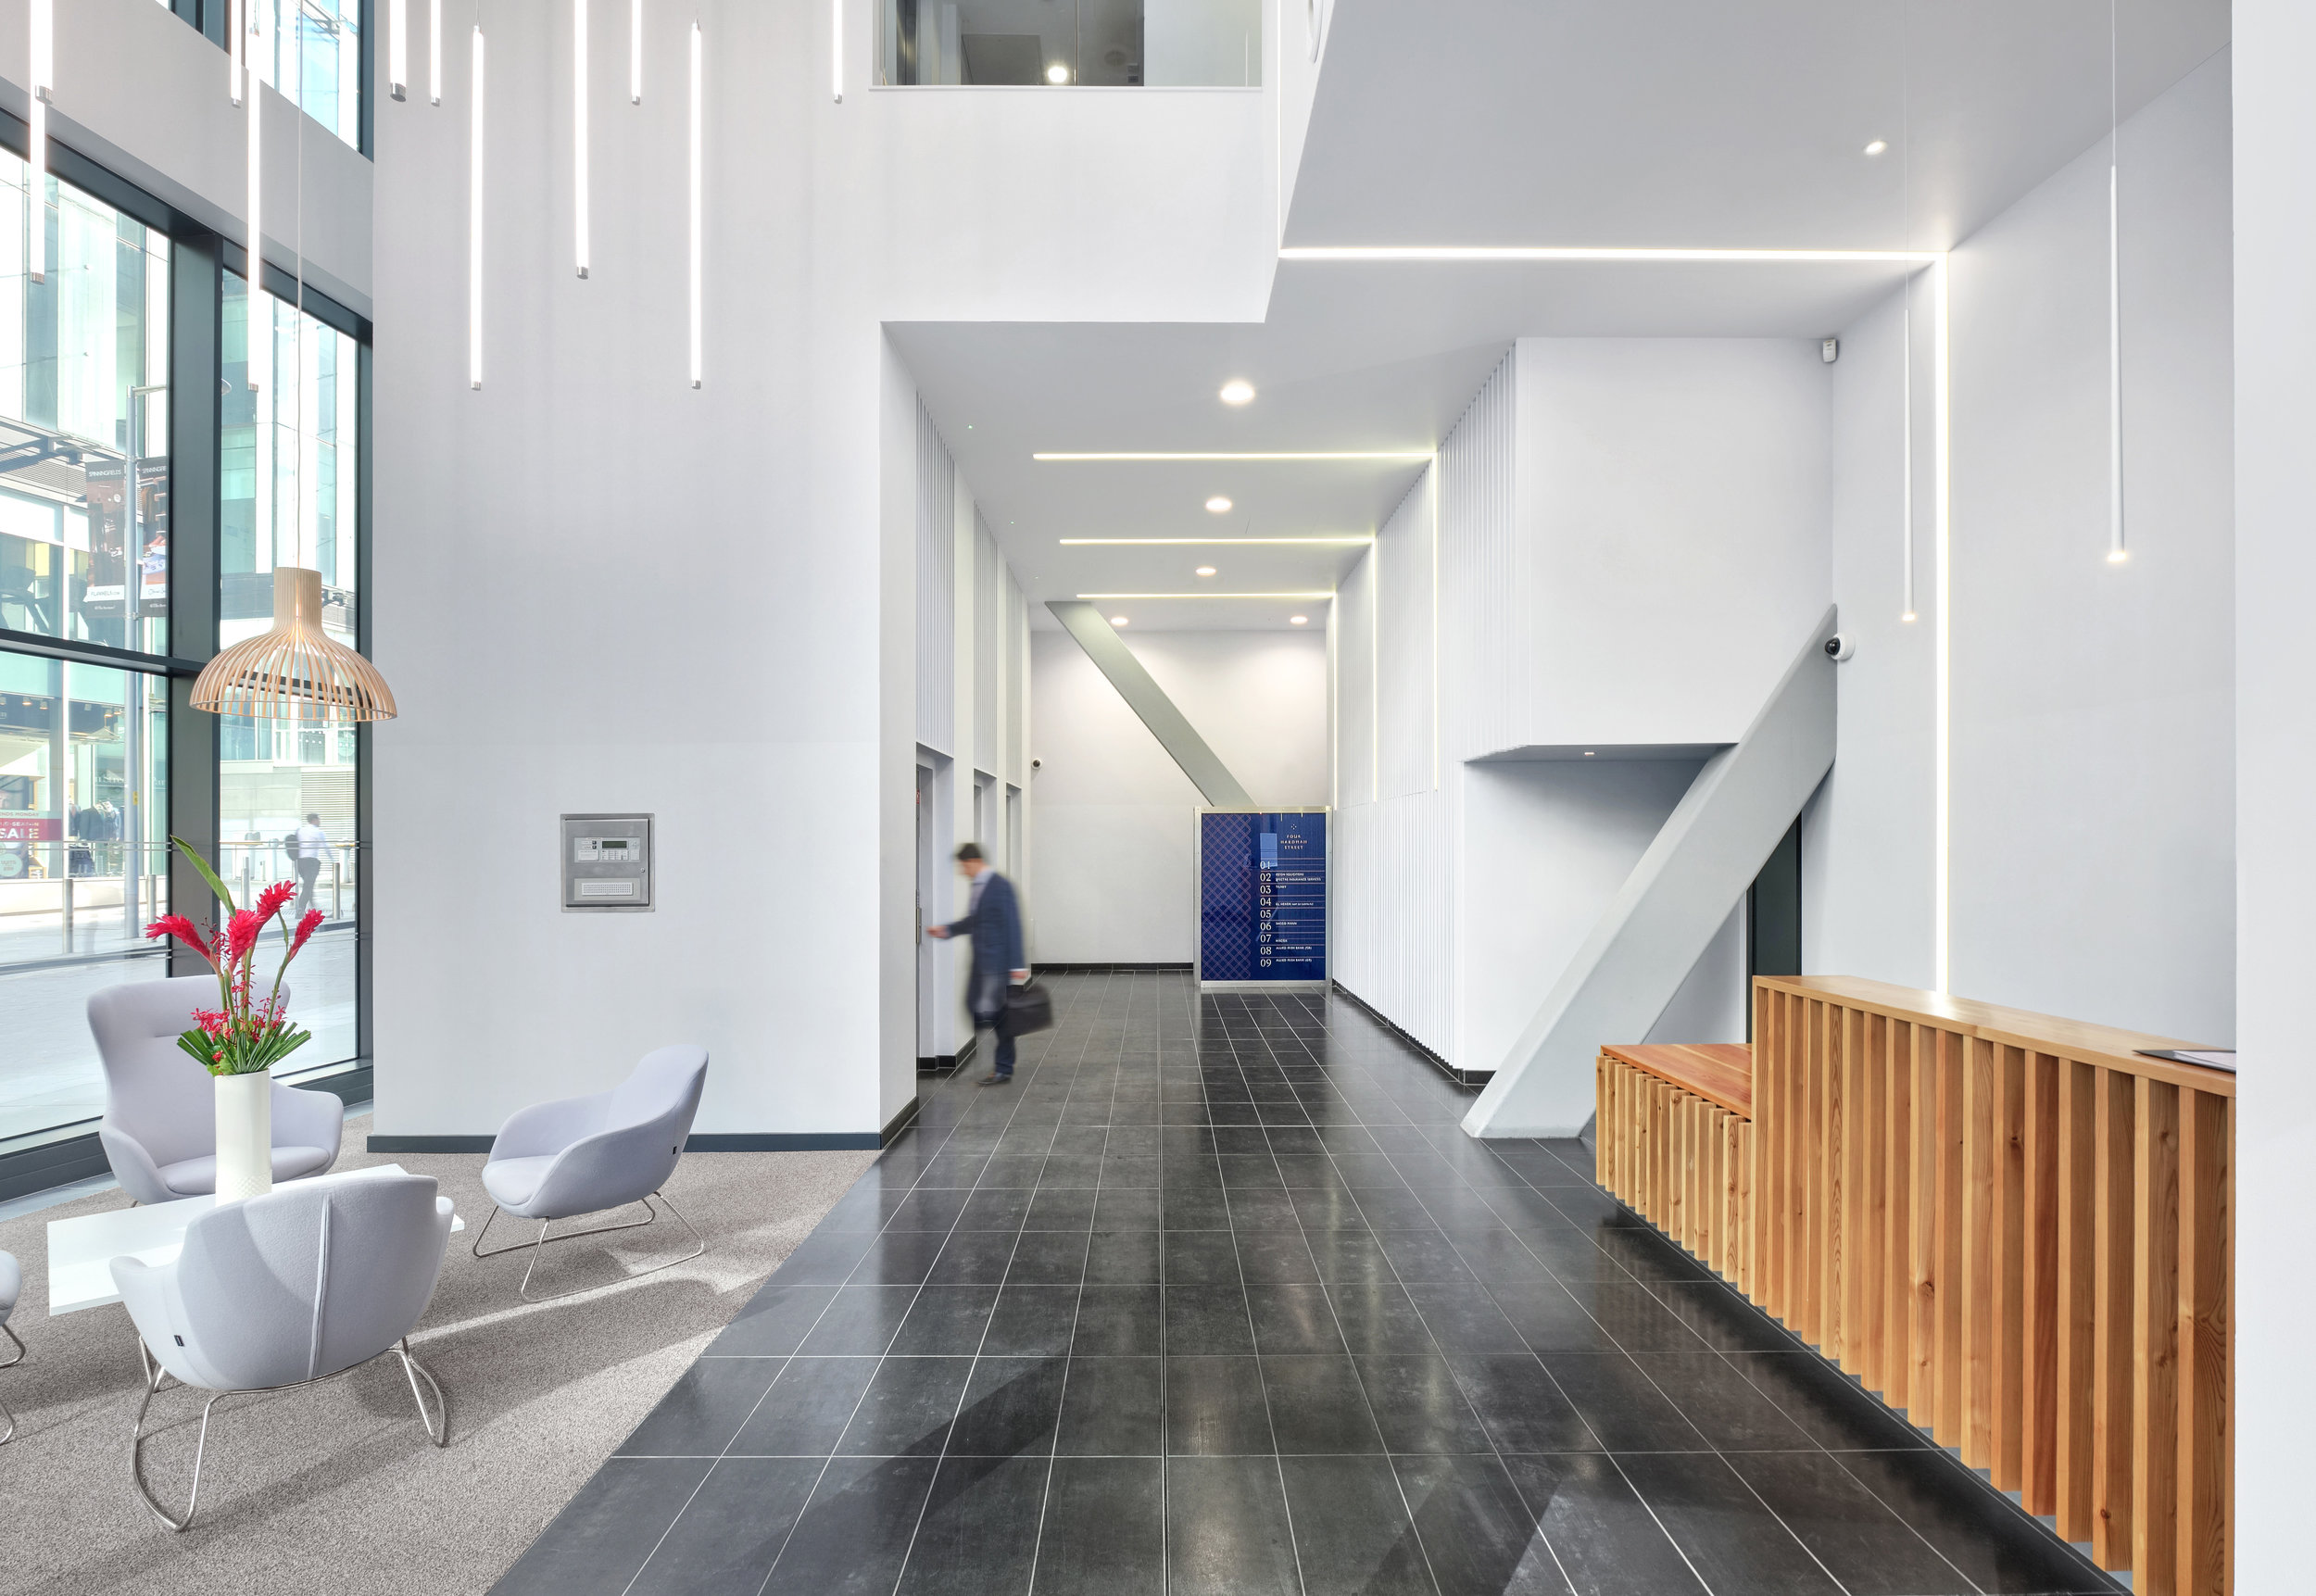 2018-04-19_Hardman Square_Up North Architects_Manchester_DSCF2290-IridientEdit-Edit.jpg